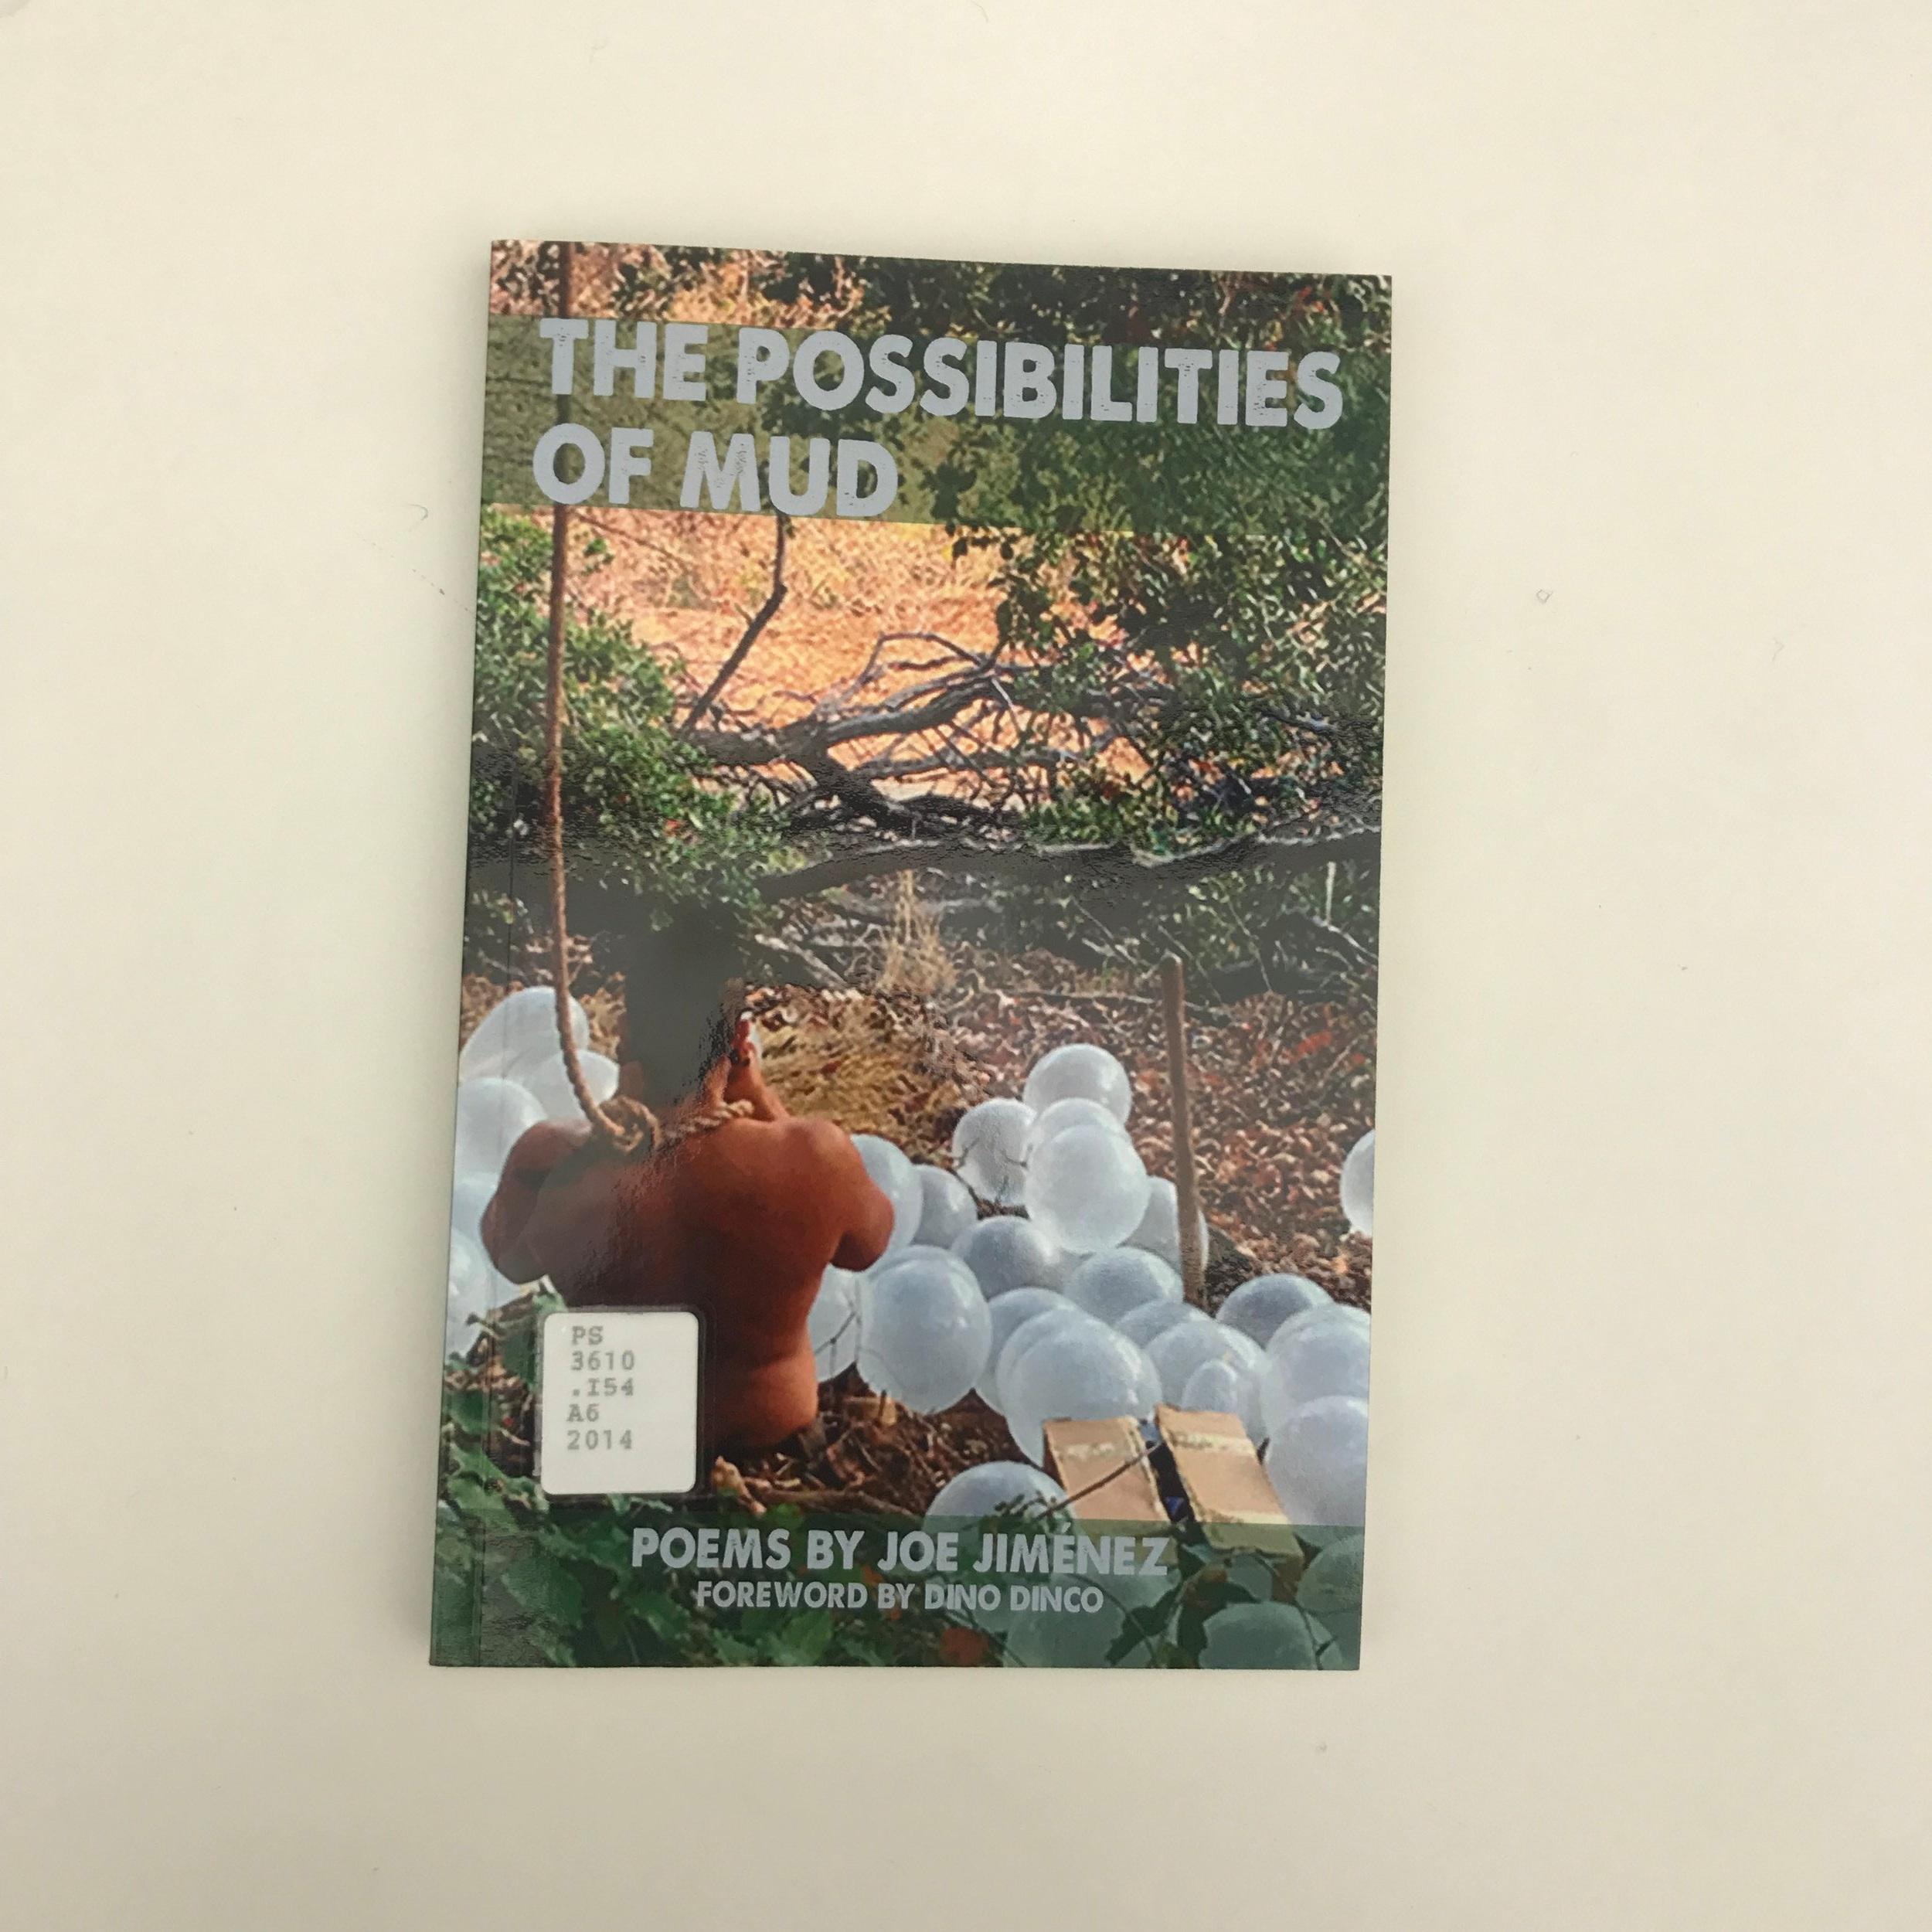 The Possibilities of Mud by Joe Jimenez